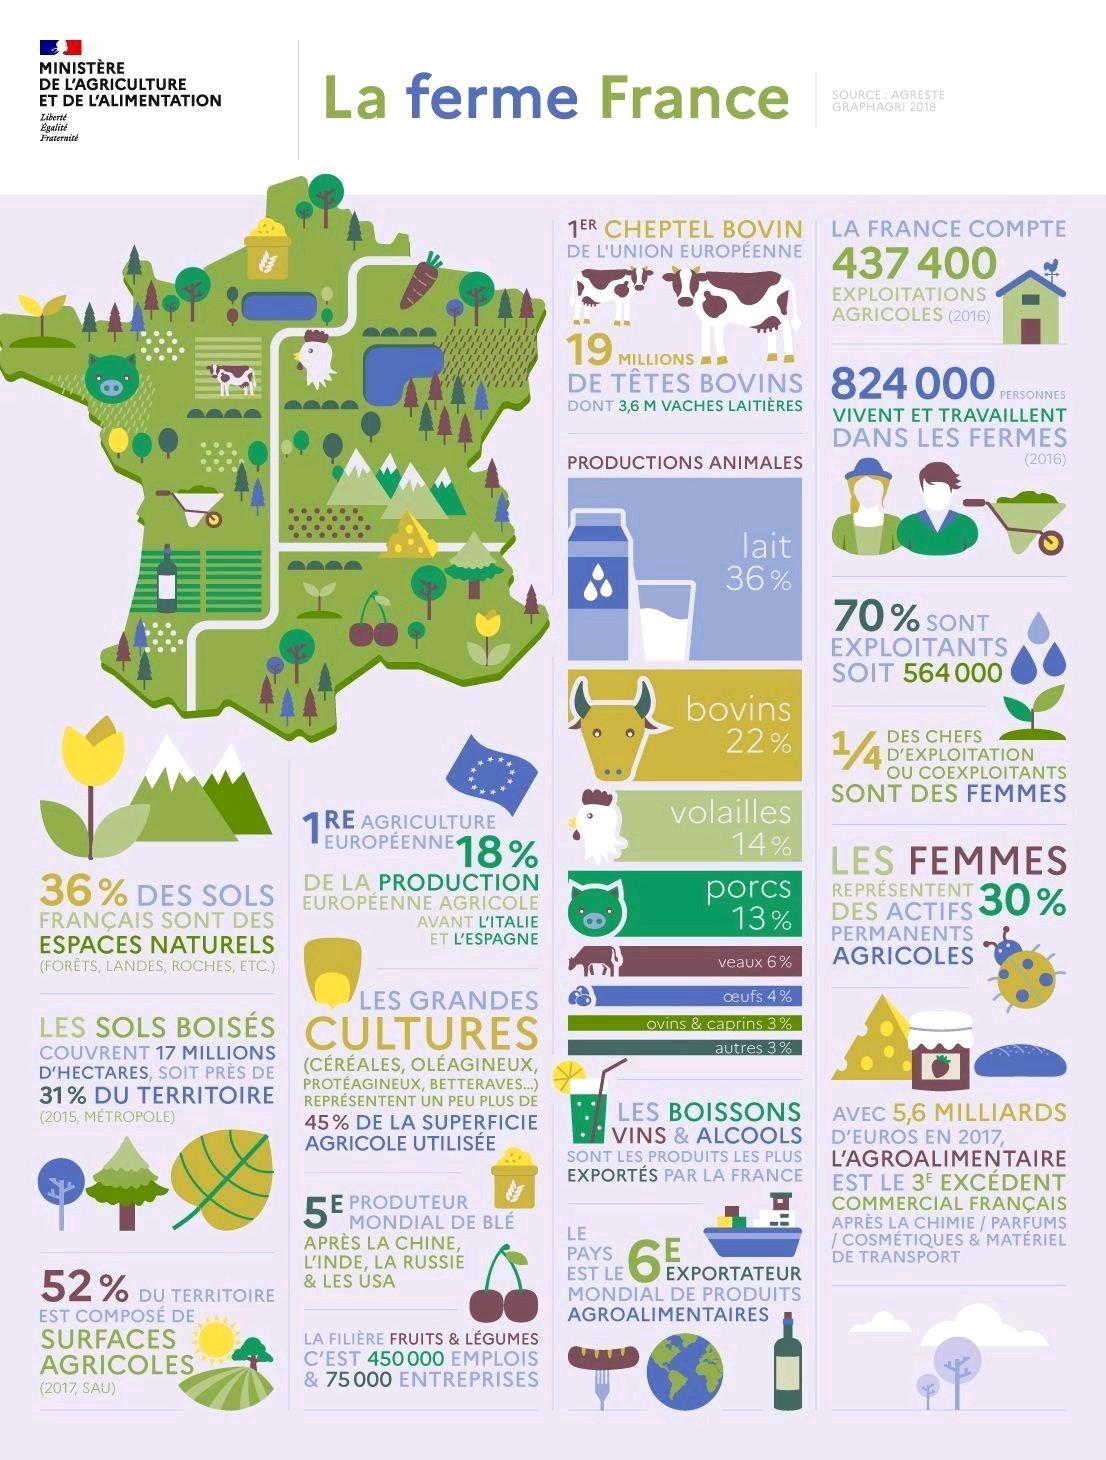 image 588f58a3 da70 465b a5fe 7553ebc859ca20200805 222934 - Infographie : la Ferme France